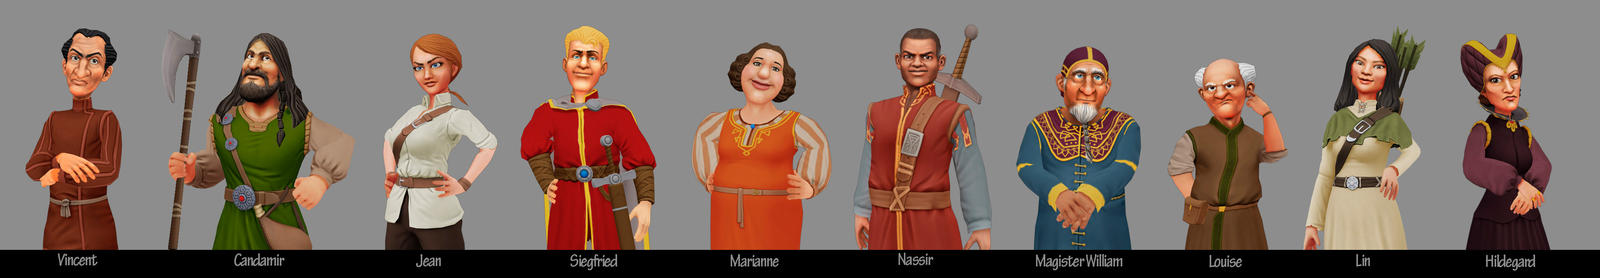 Catan Charakter-lineup by pixelchaot